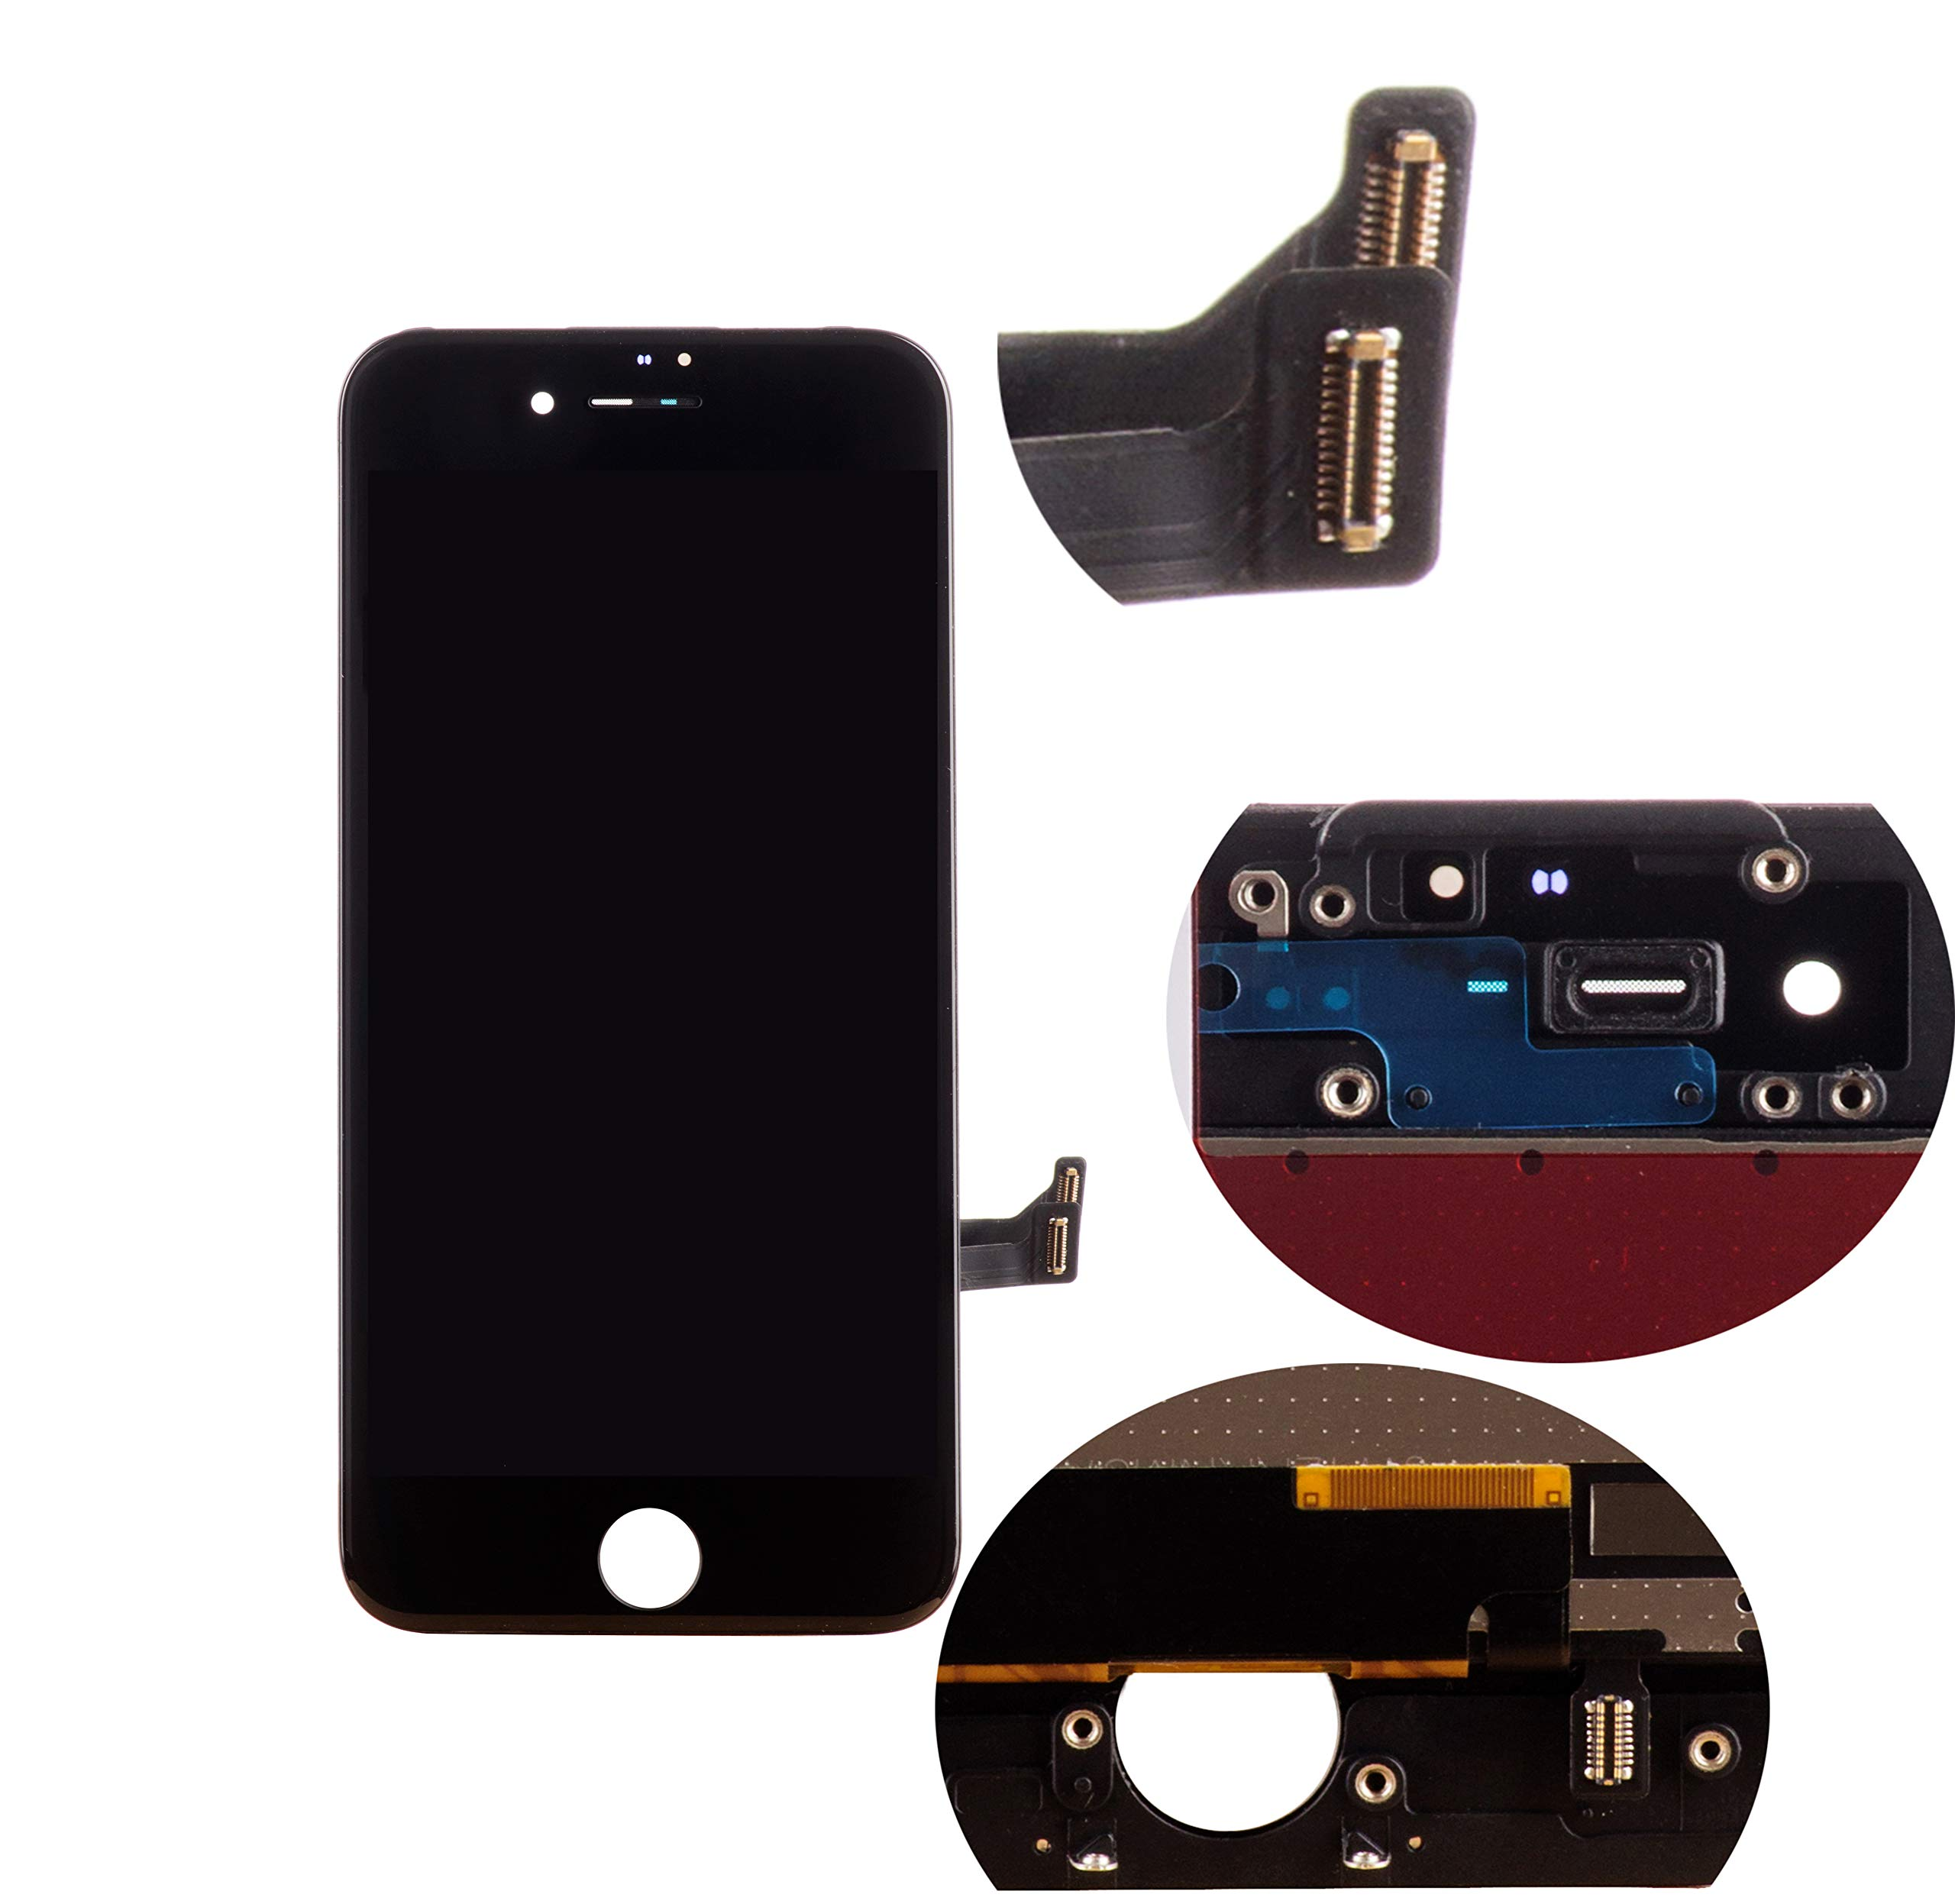 Modulo LCD Negro para IPhone 7 Plus 5.5 Inch  -637